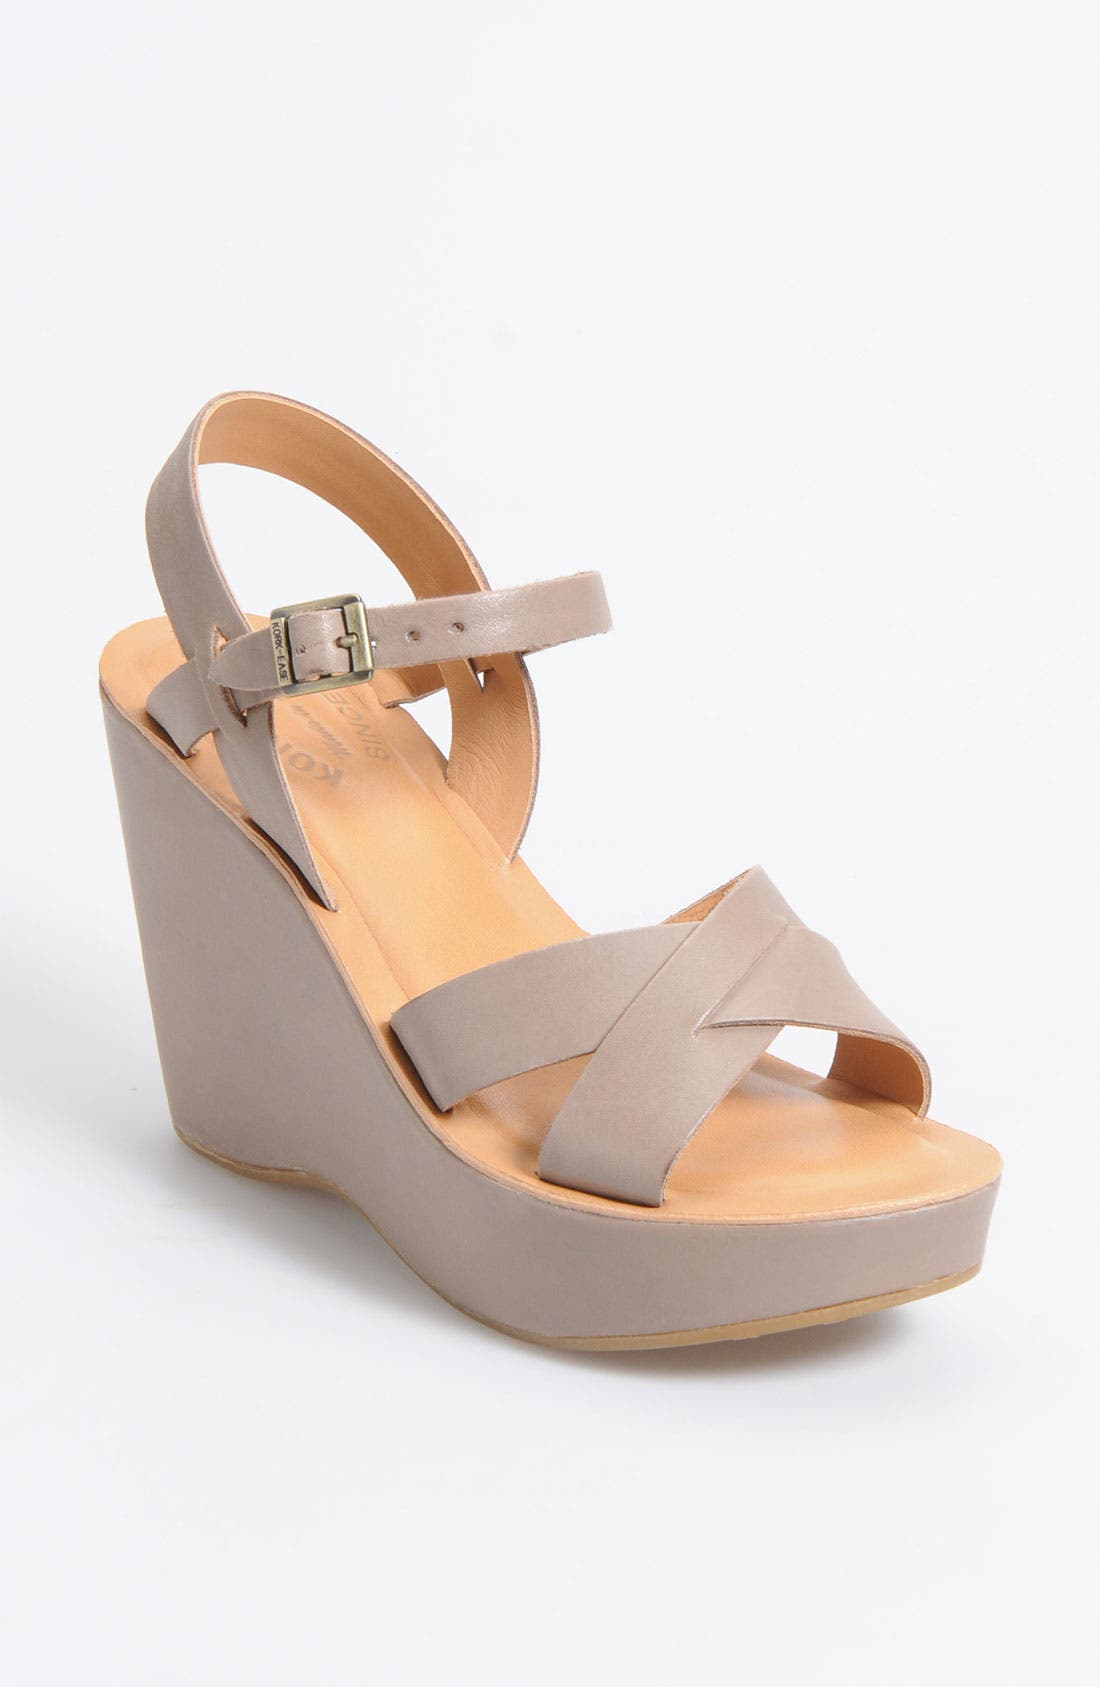 Main Image - Kork-Ease 'Bette' Wedge Sandal (Nordstrom Exclusive)